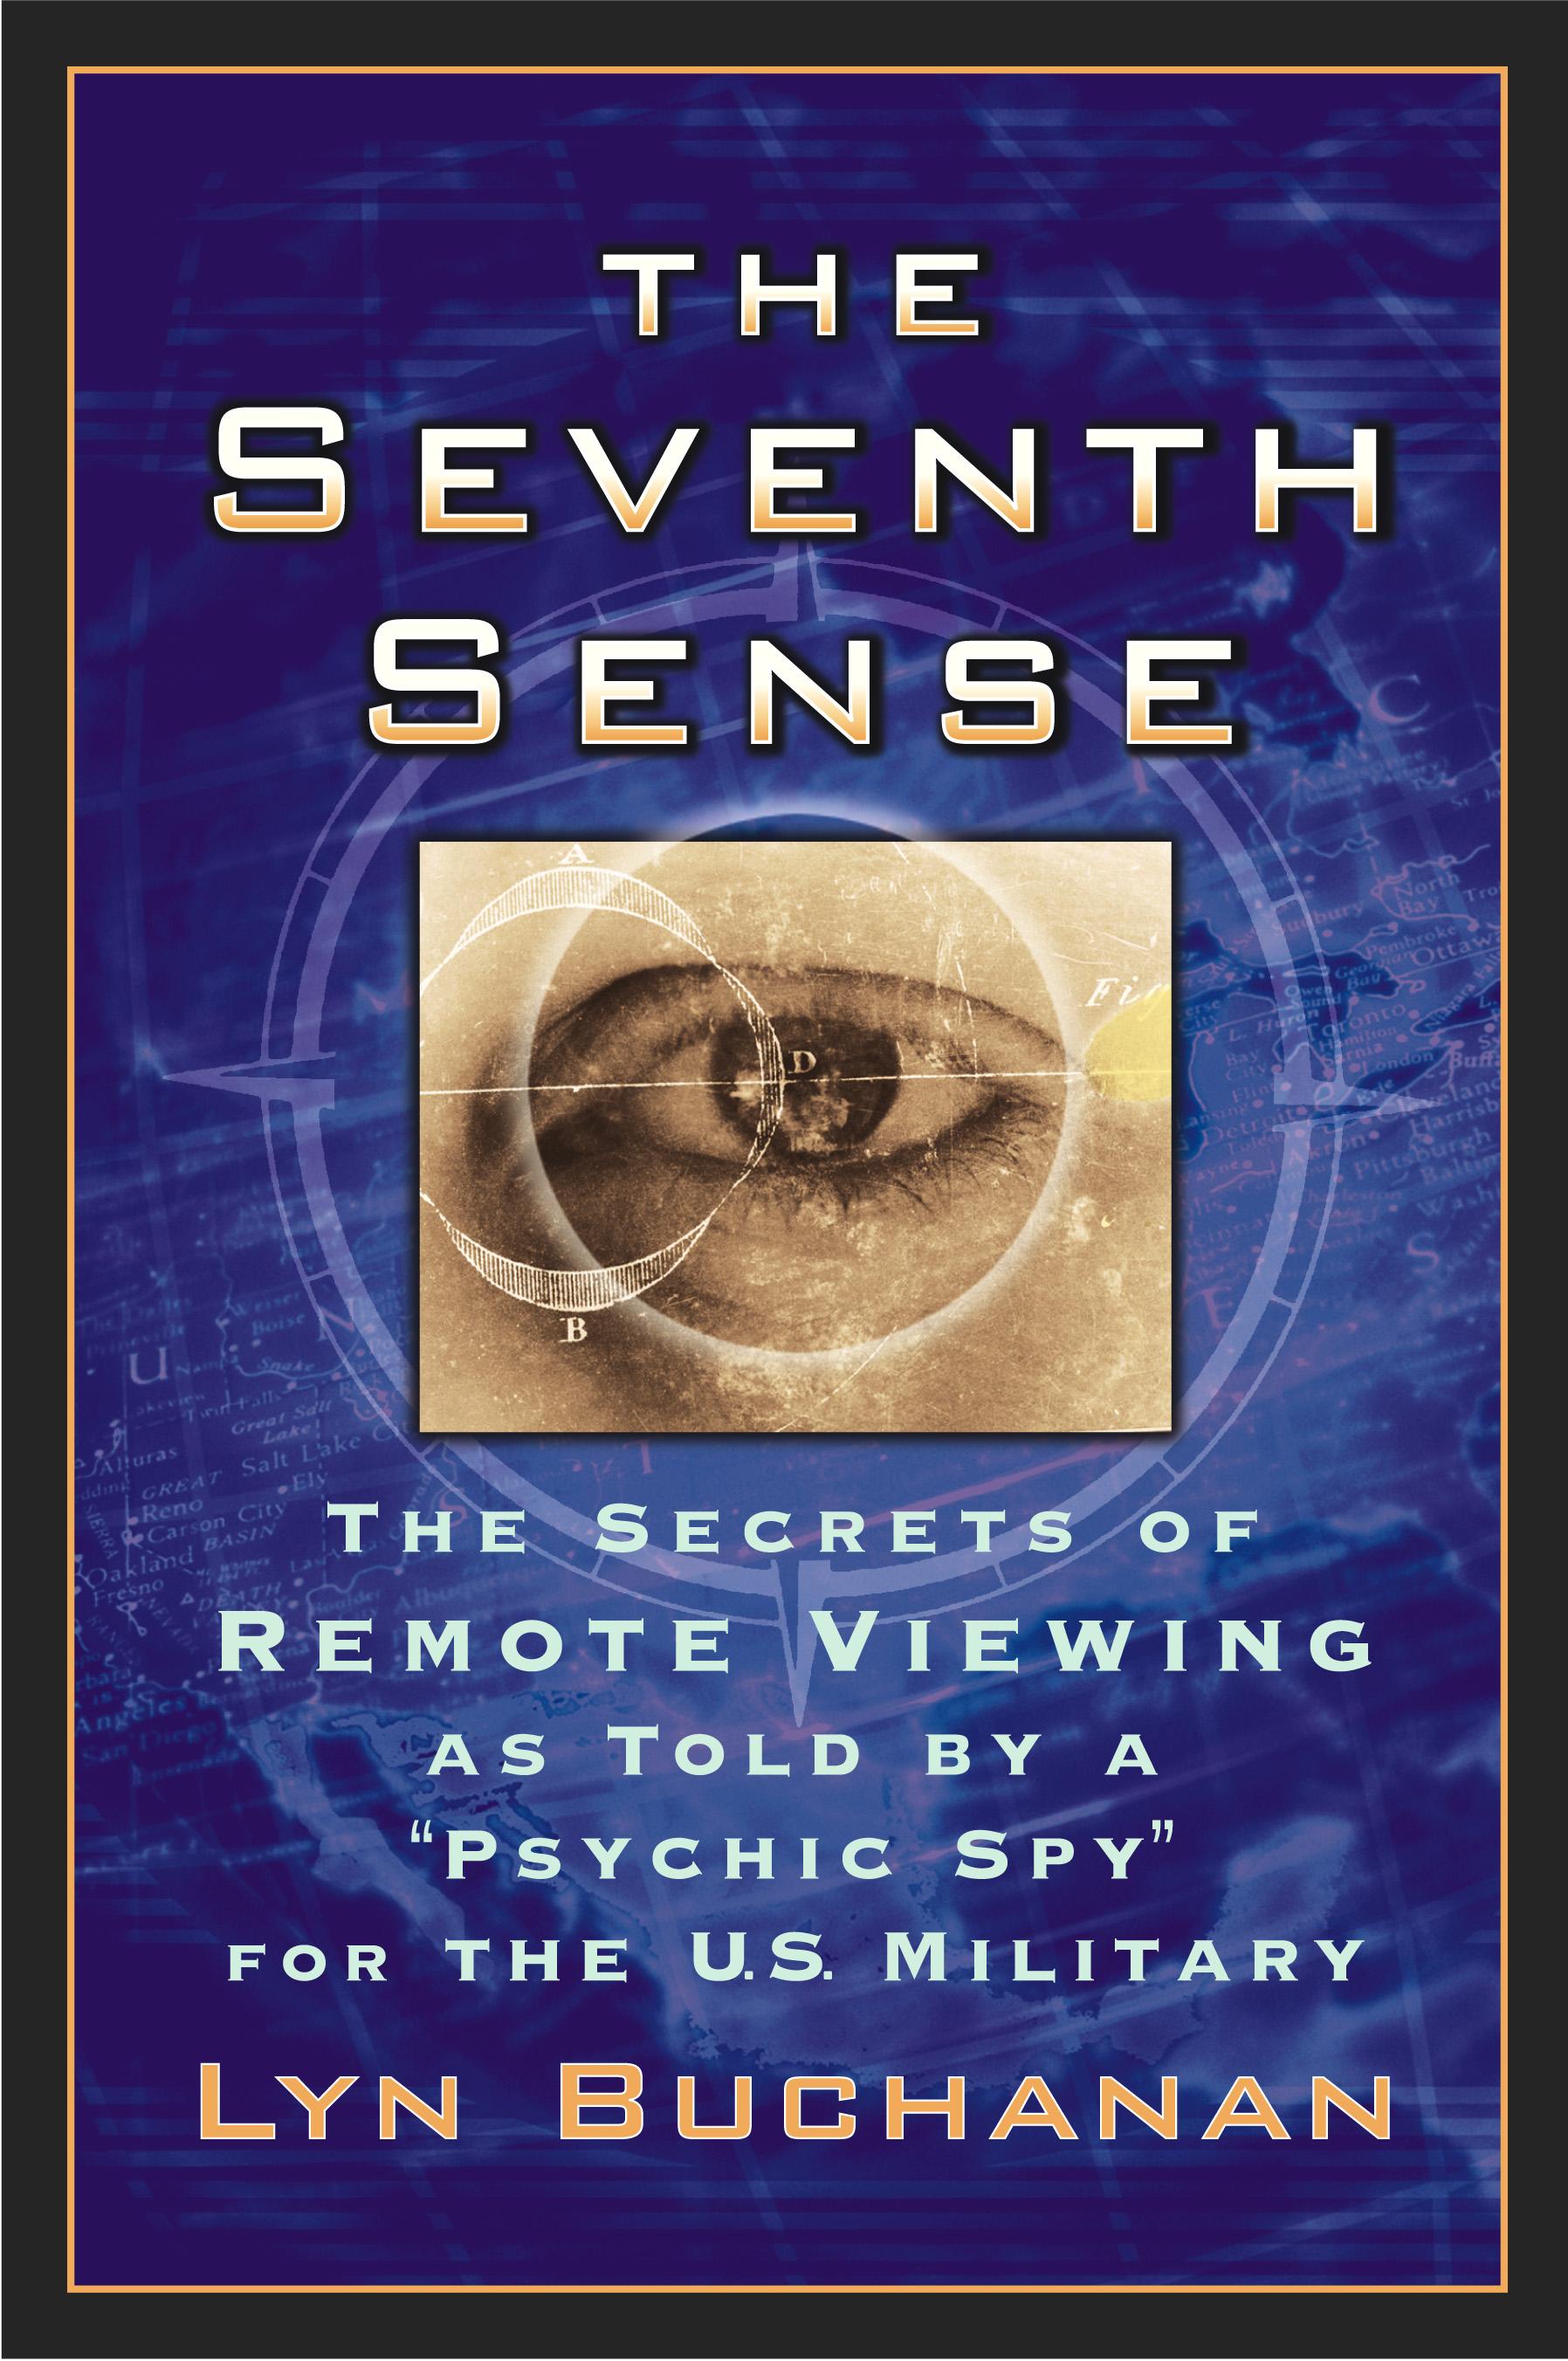 The seventh sense by lyn buchanan